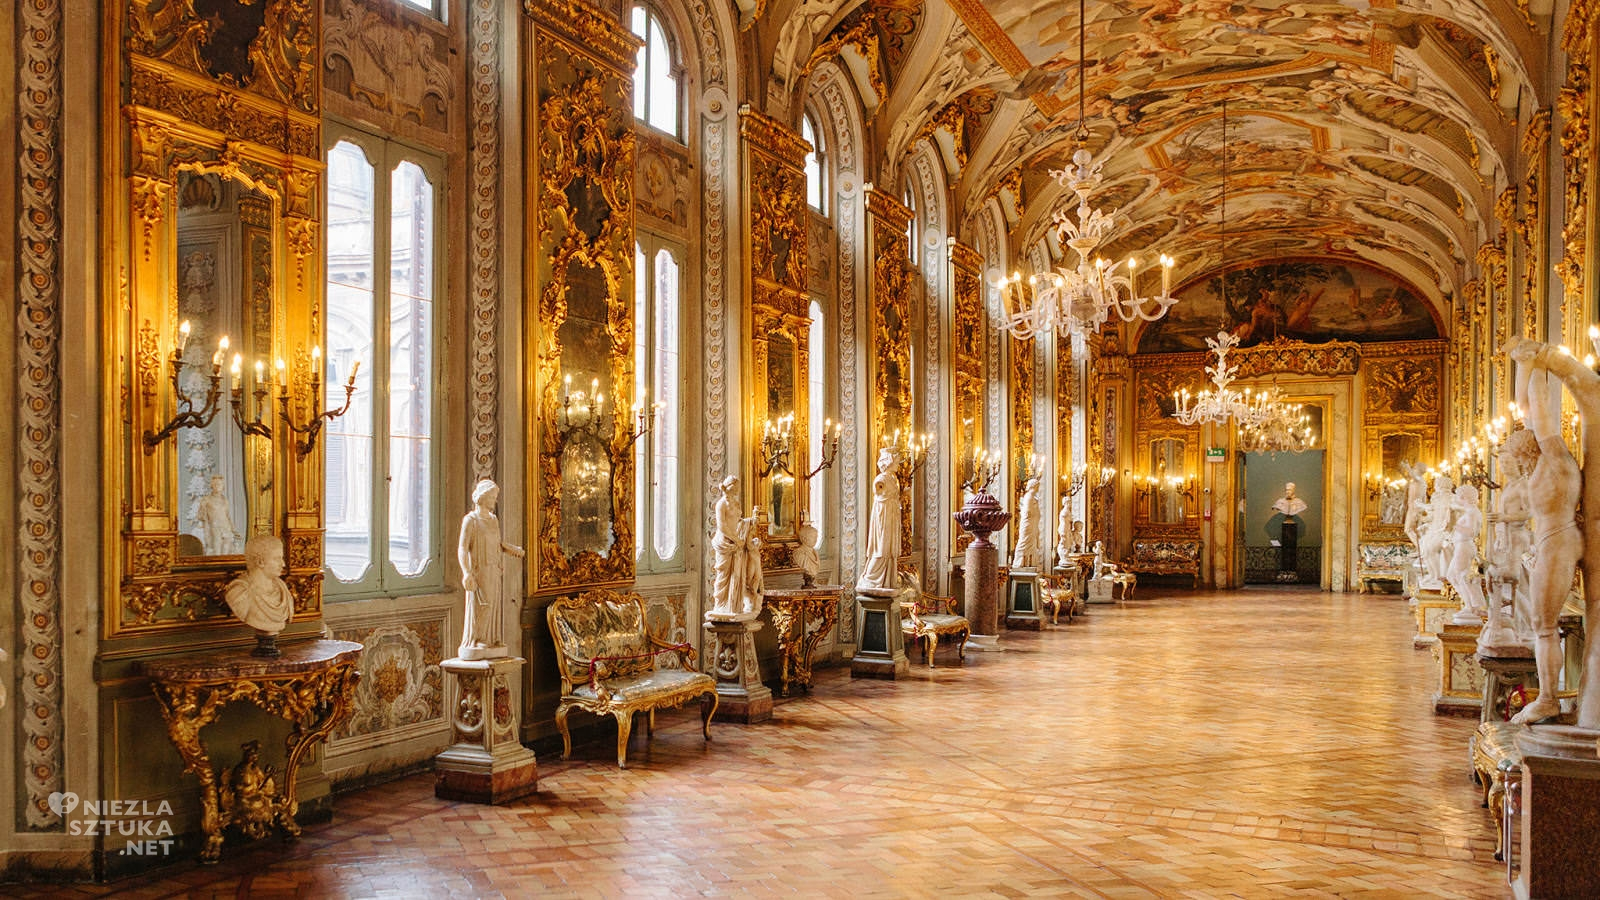 Palazzo Doria Pamphilj, rzym, niezła sztuka